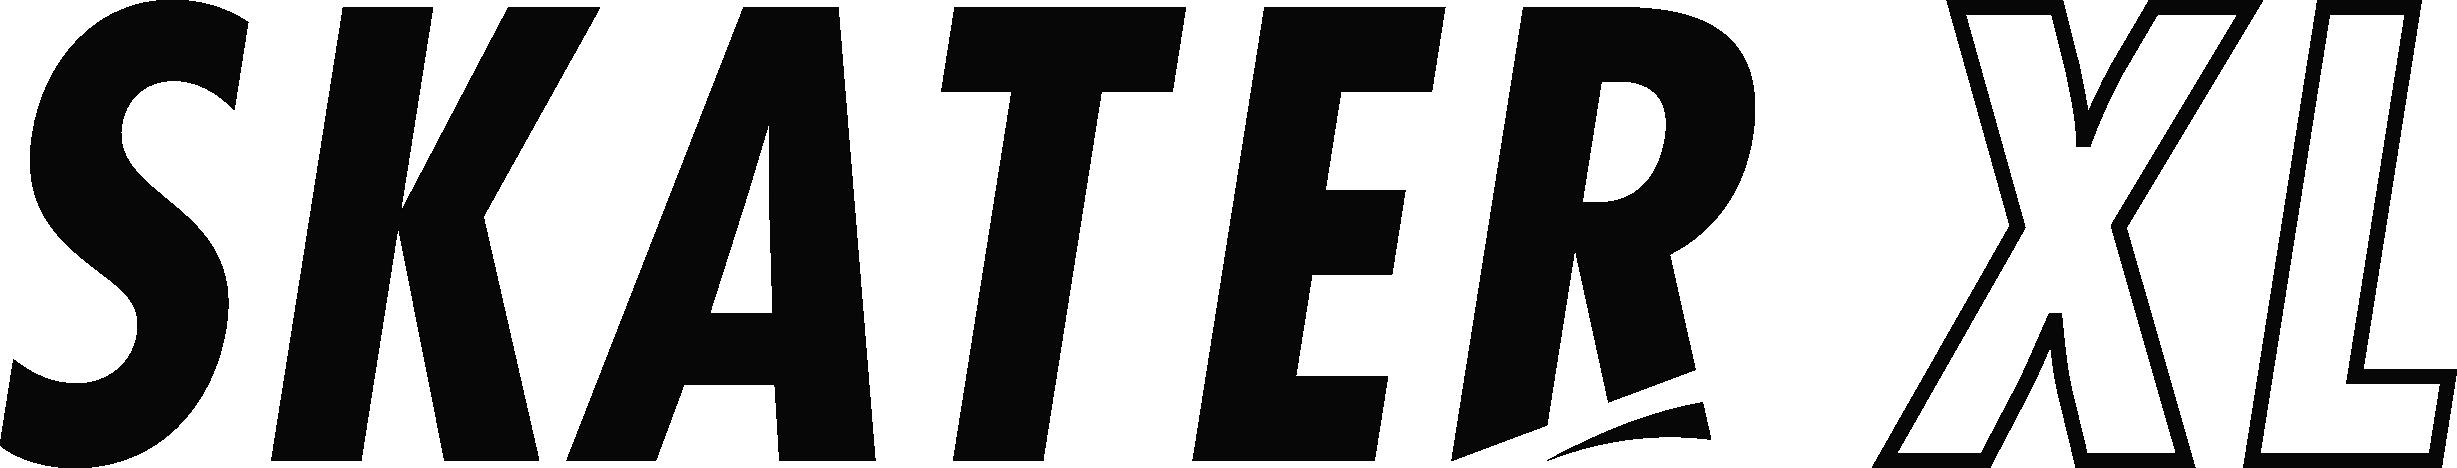 skater-xl-logo@3x